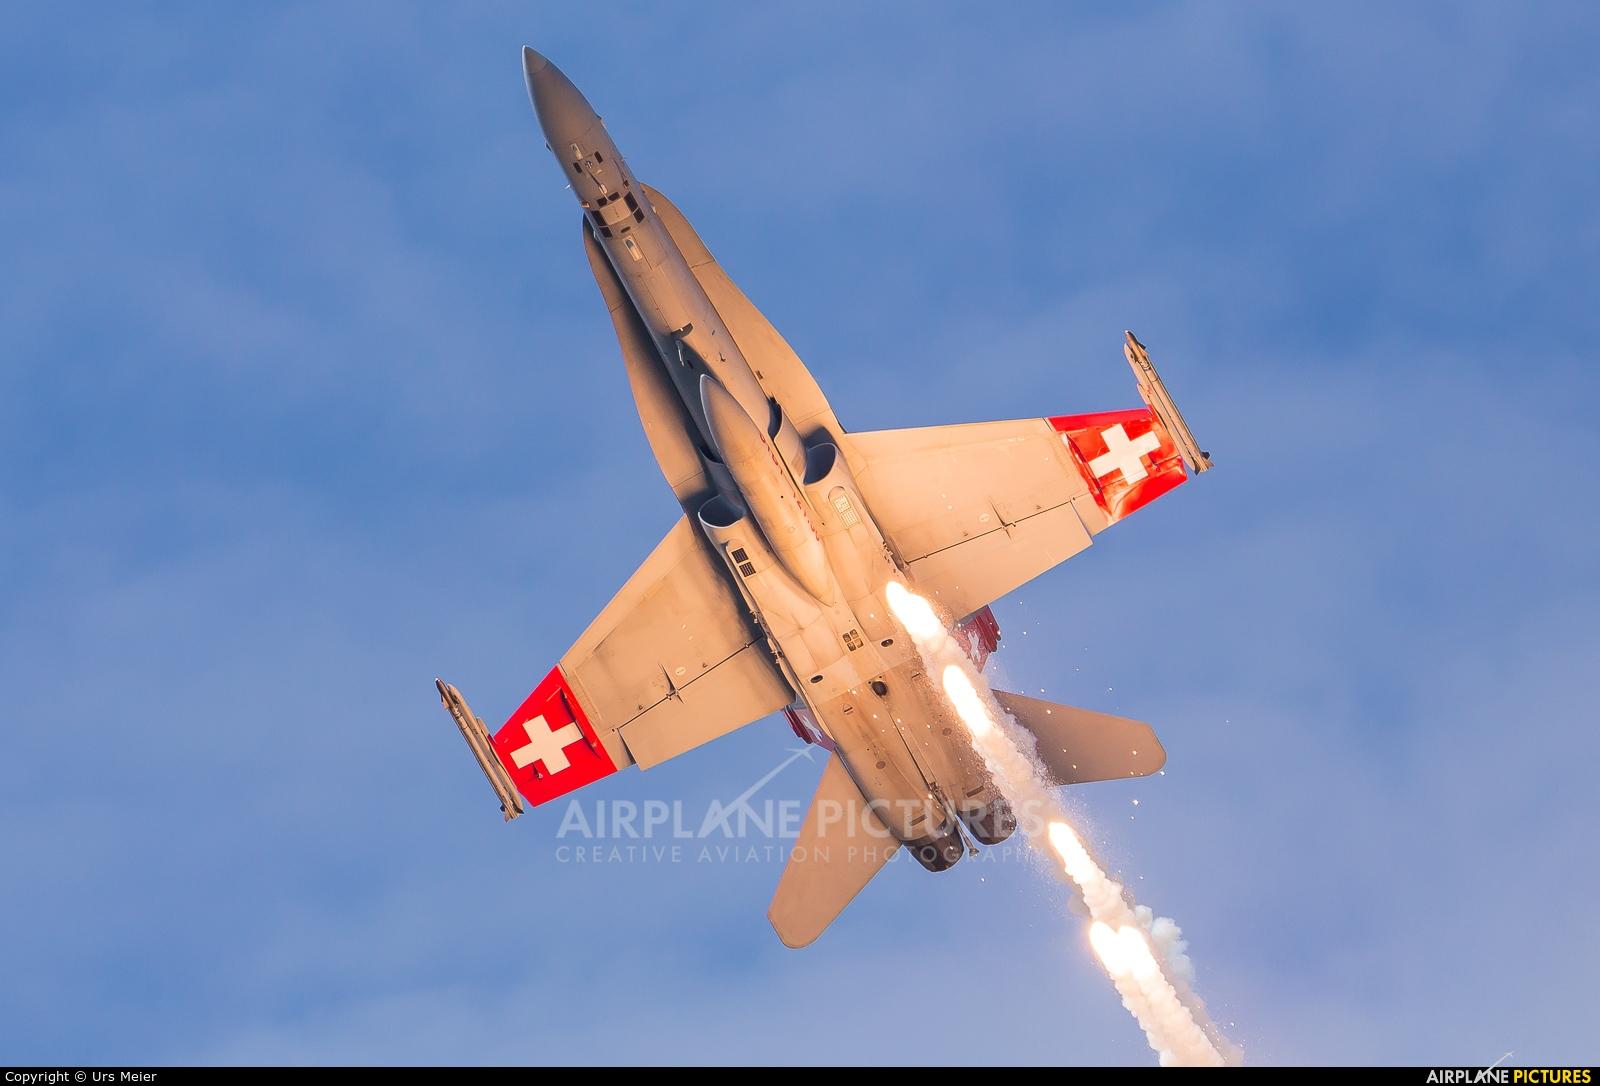 Switzerland - Air Force J-5014 aircraft at Payerne